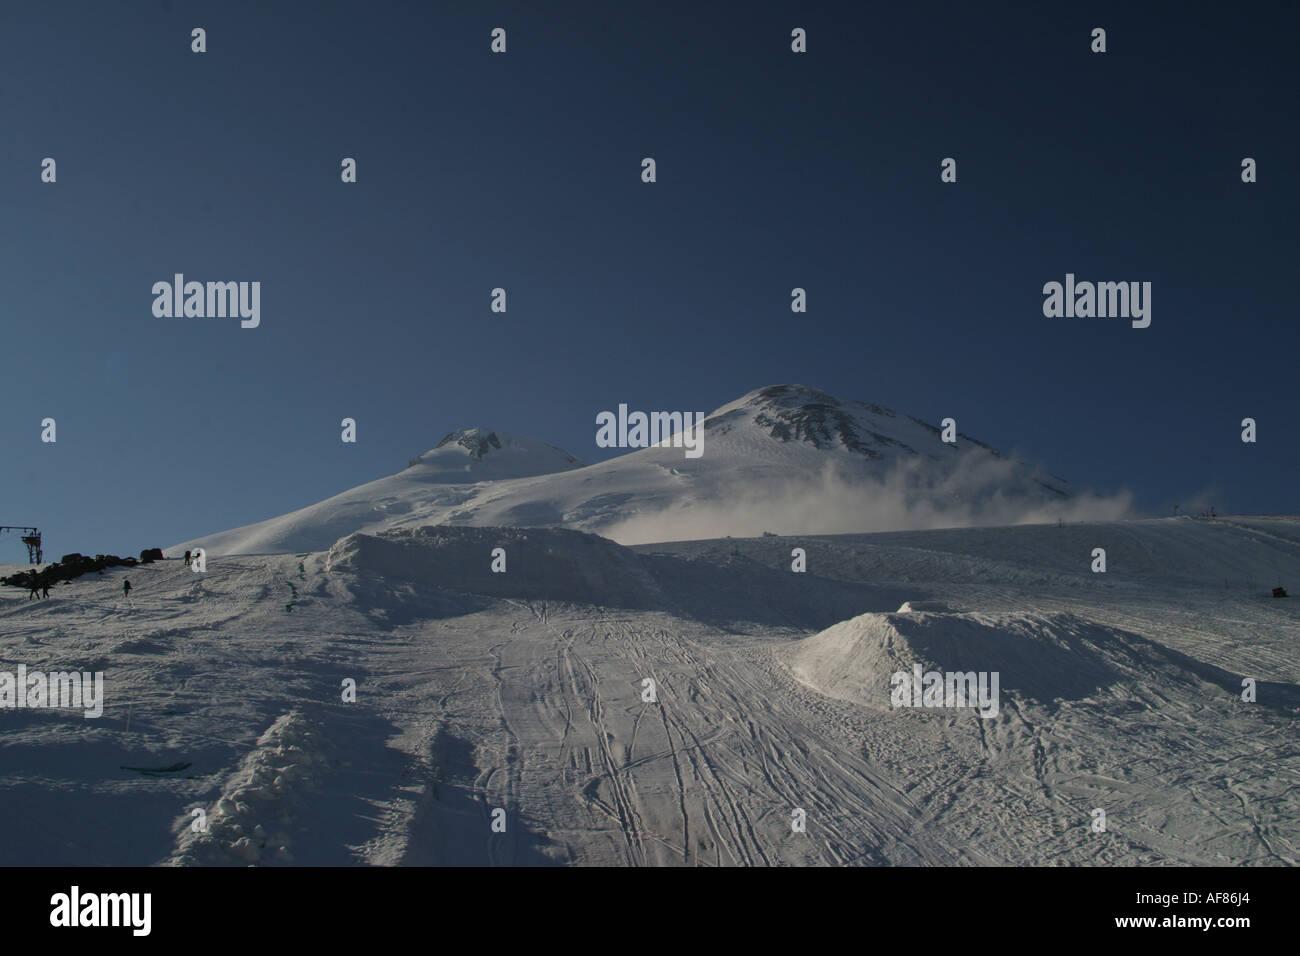 Mountains landscape 22 - Evening Elbrus in pure blue sky and snowboard big-airs, Caucasus, Elbrus region, Kabardino-Balkari - Stock Image